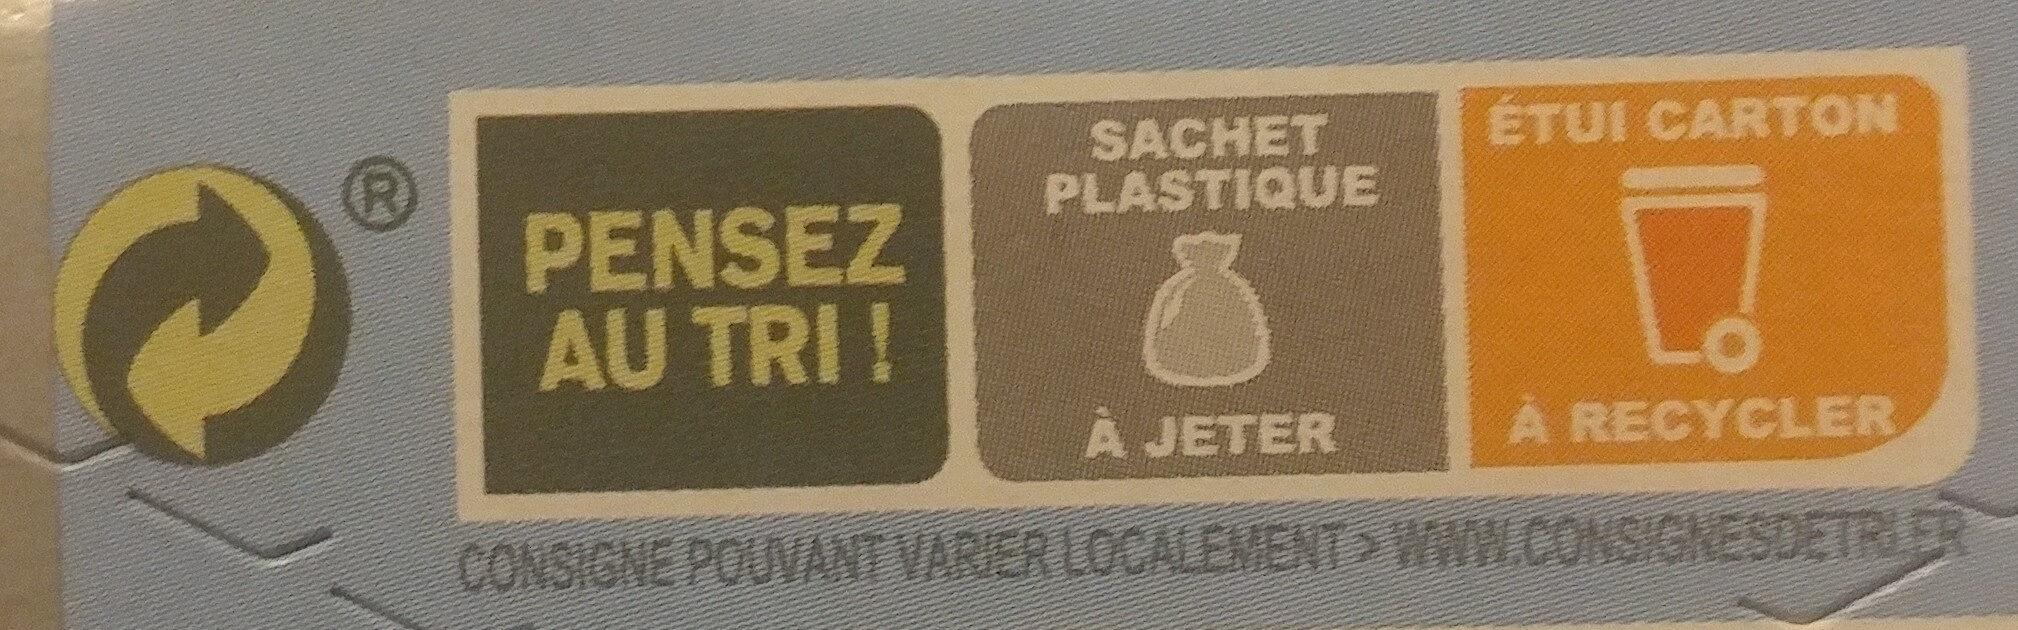 Biscuit Coco - Instruction de recyclage et/ou informations d'emballage - fr